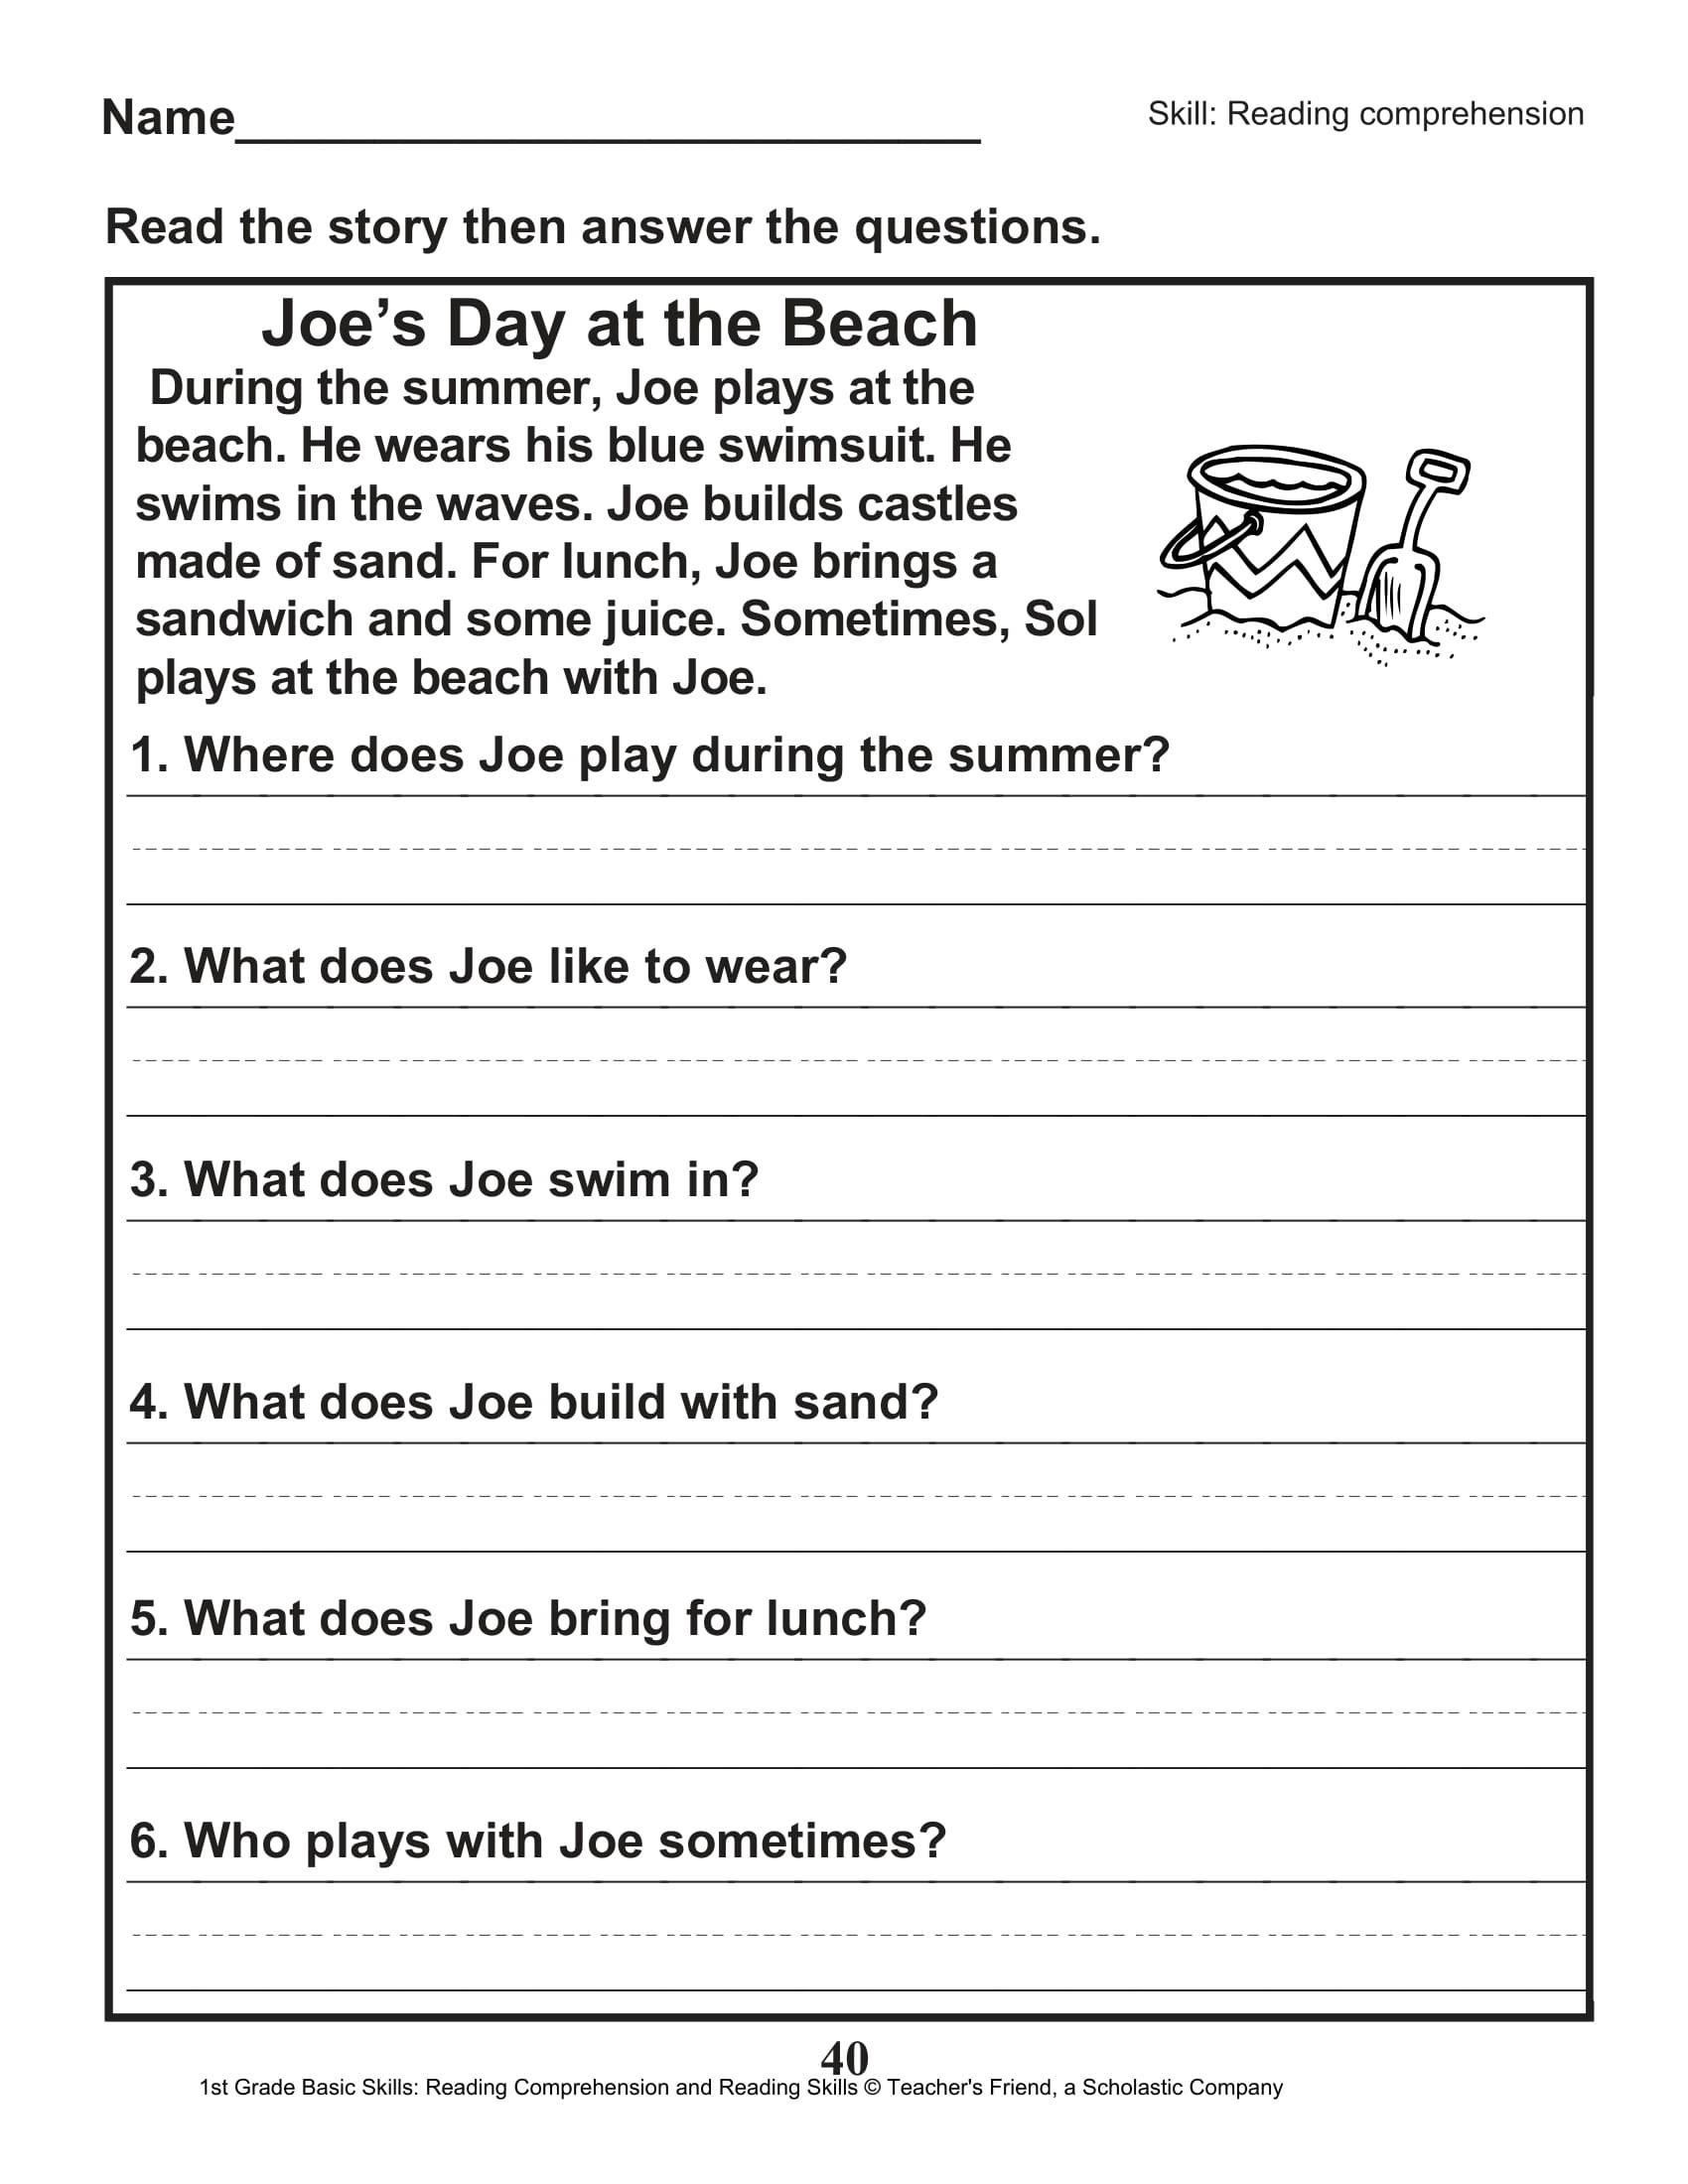 Scholastic 1st Grade Reading Comprehension Skills Worksheets 41